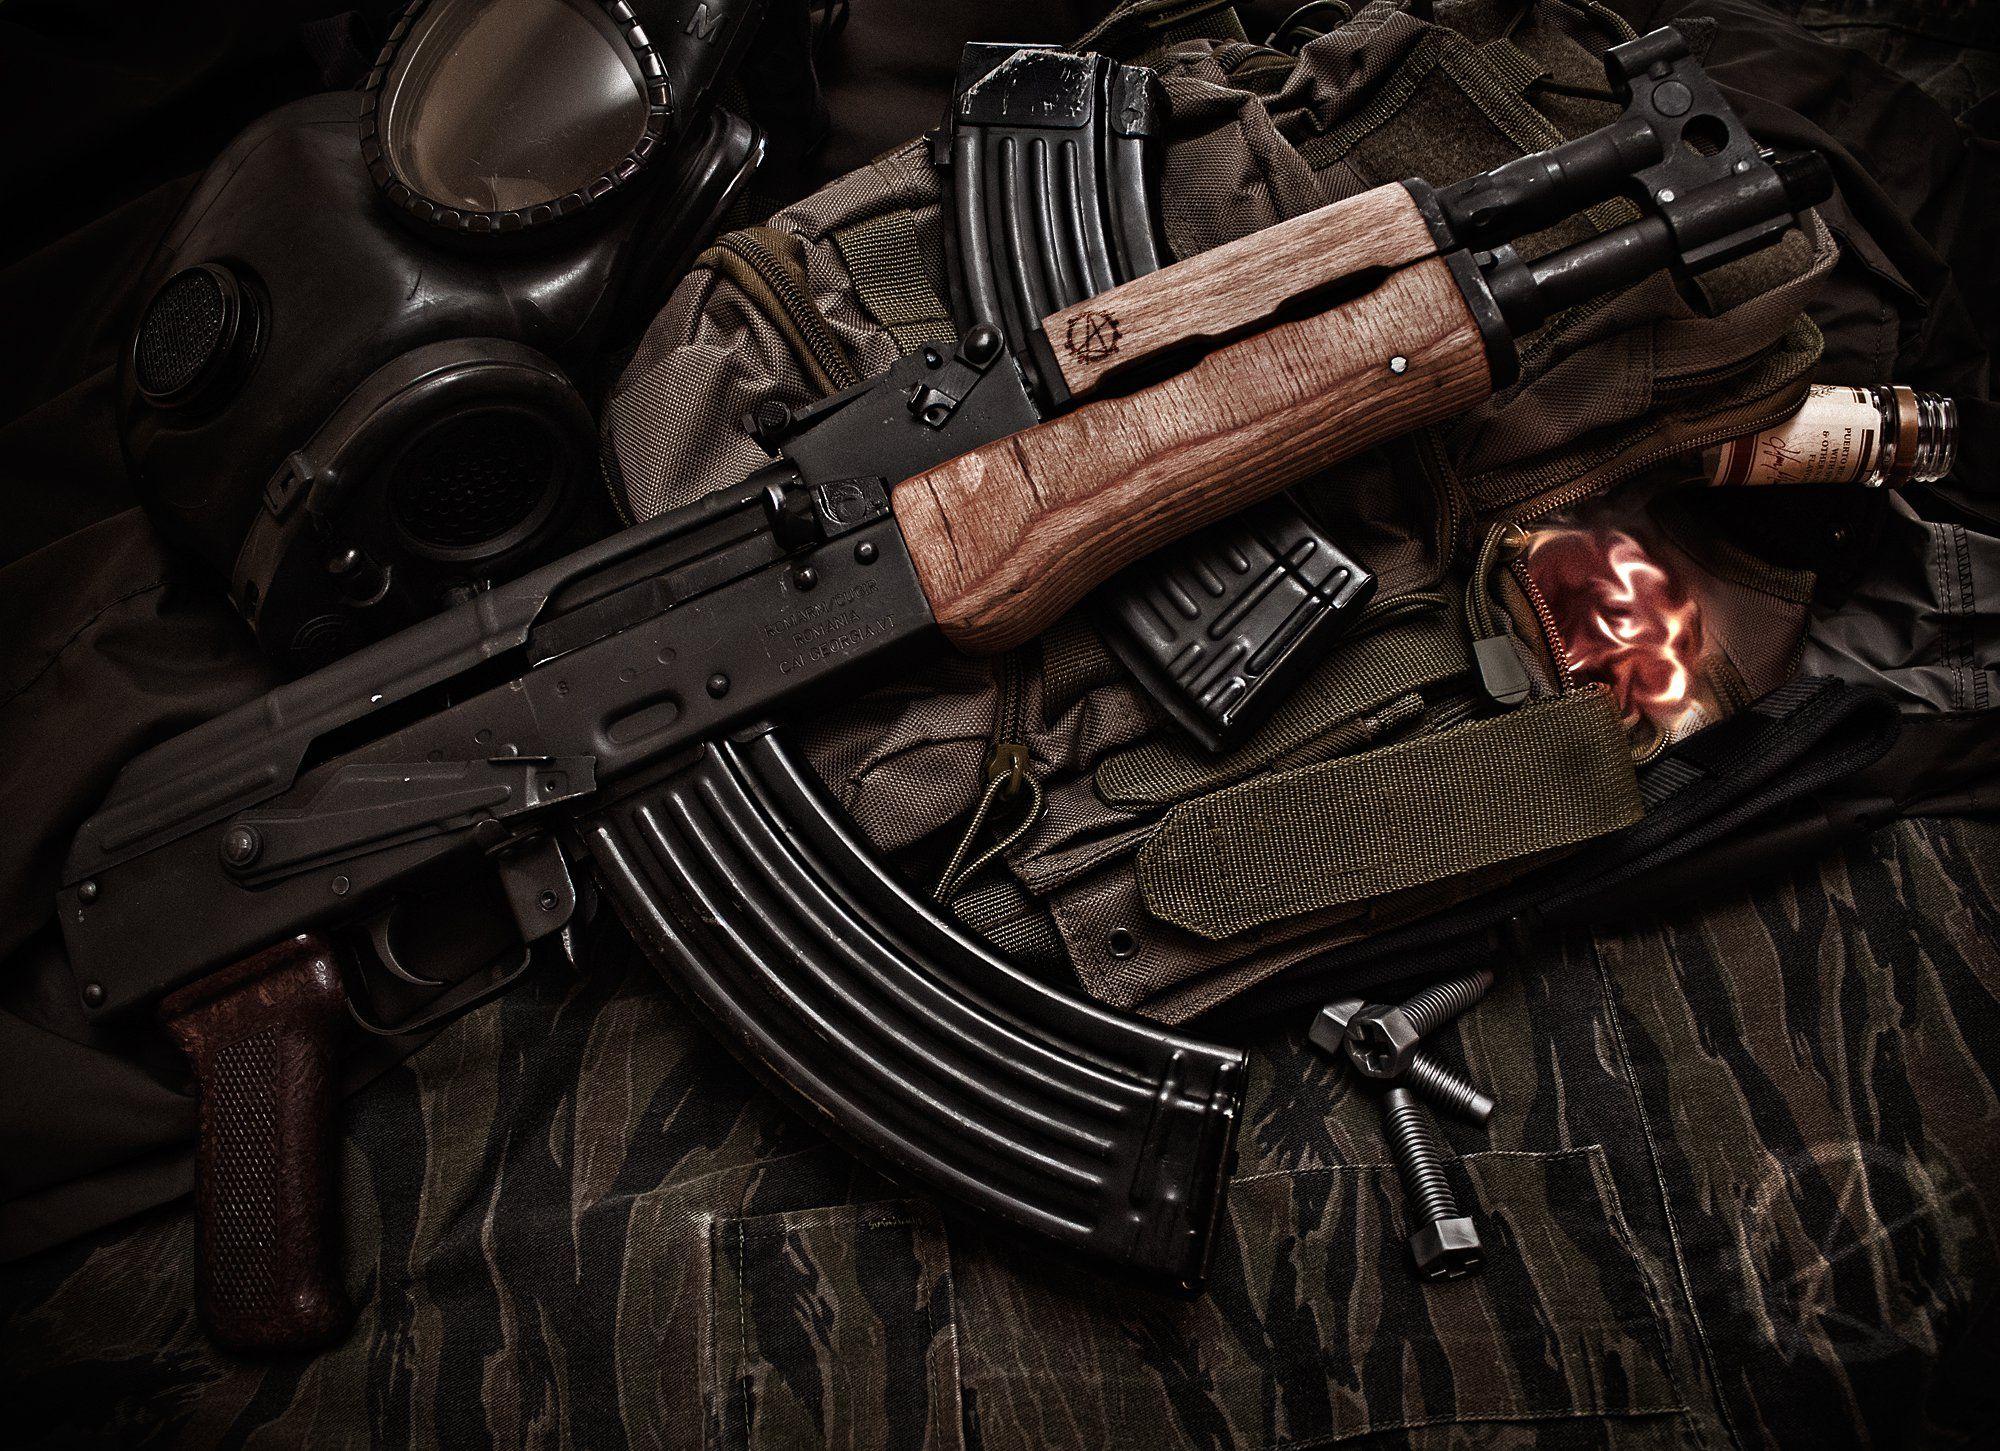 Pin on Firearm Photography 2000x1451